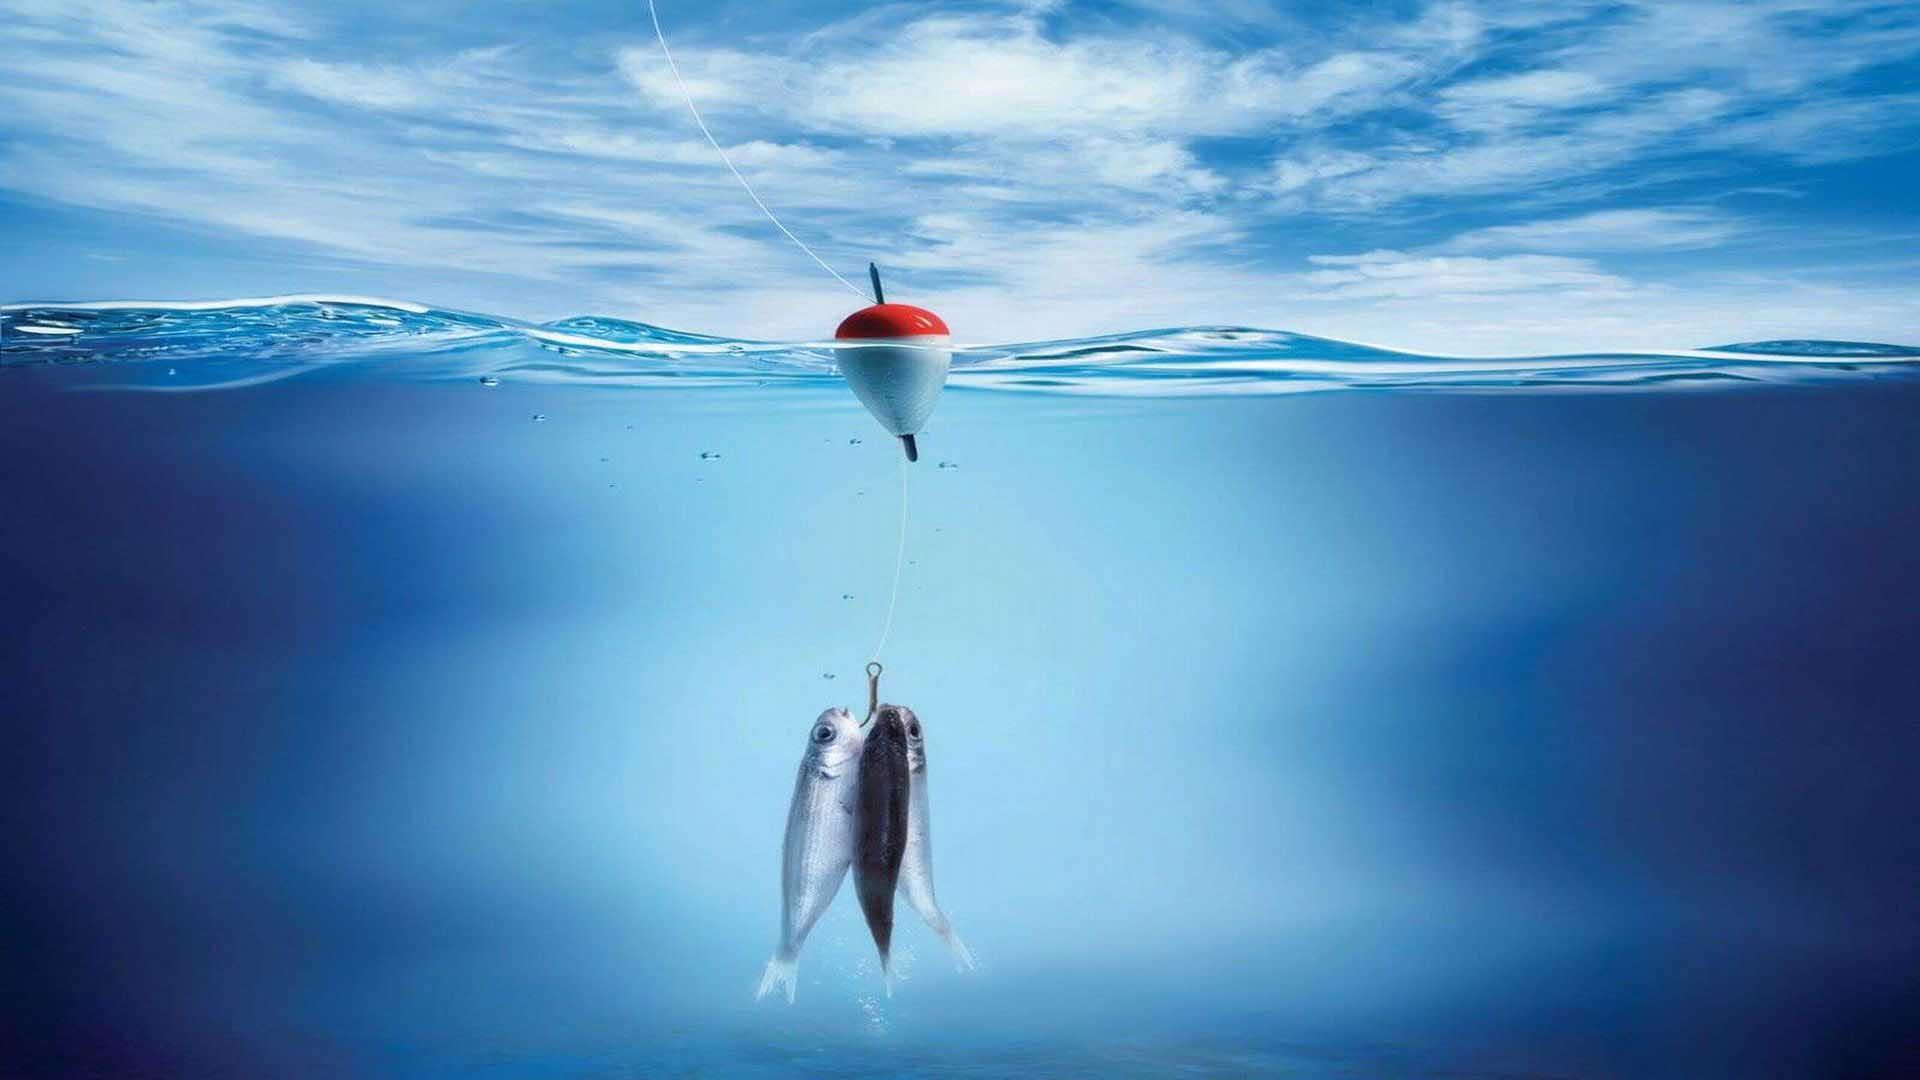 Motivational Quotes Wallpapers Hd 1080p For Pc Bass Fishing Wallpaper Hd Pixelstalk Net